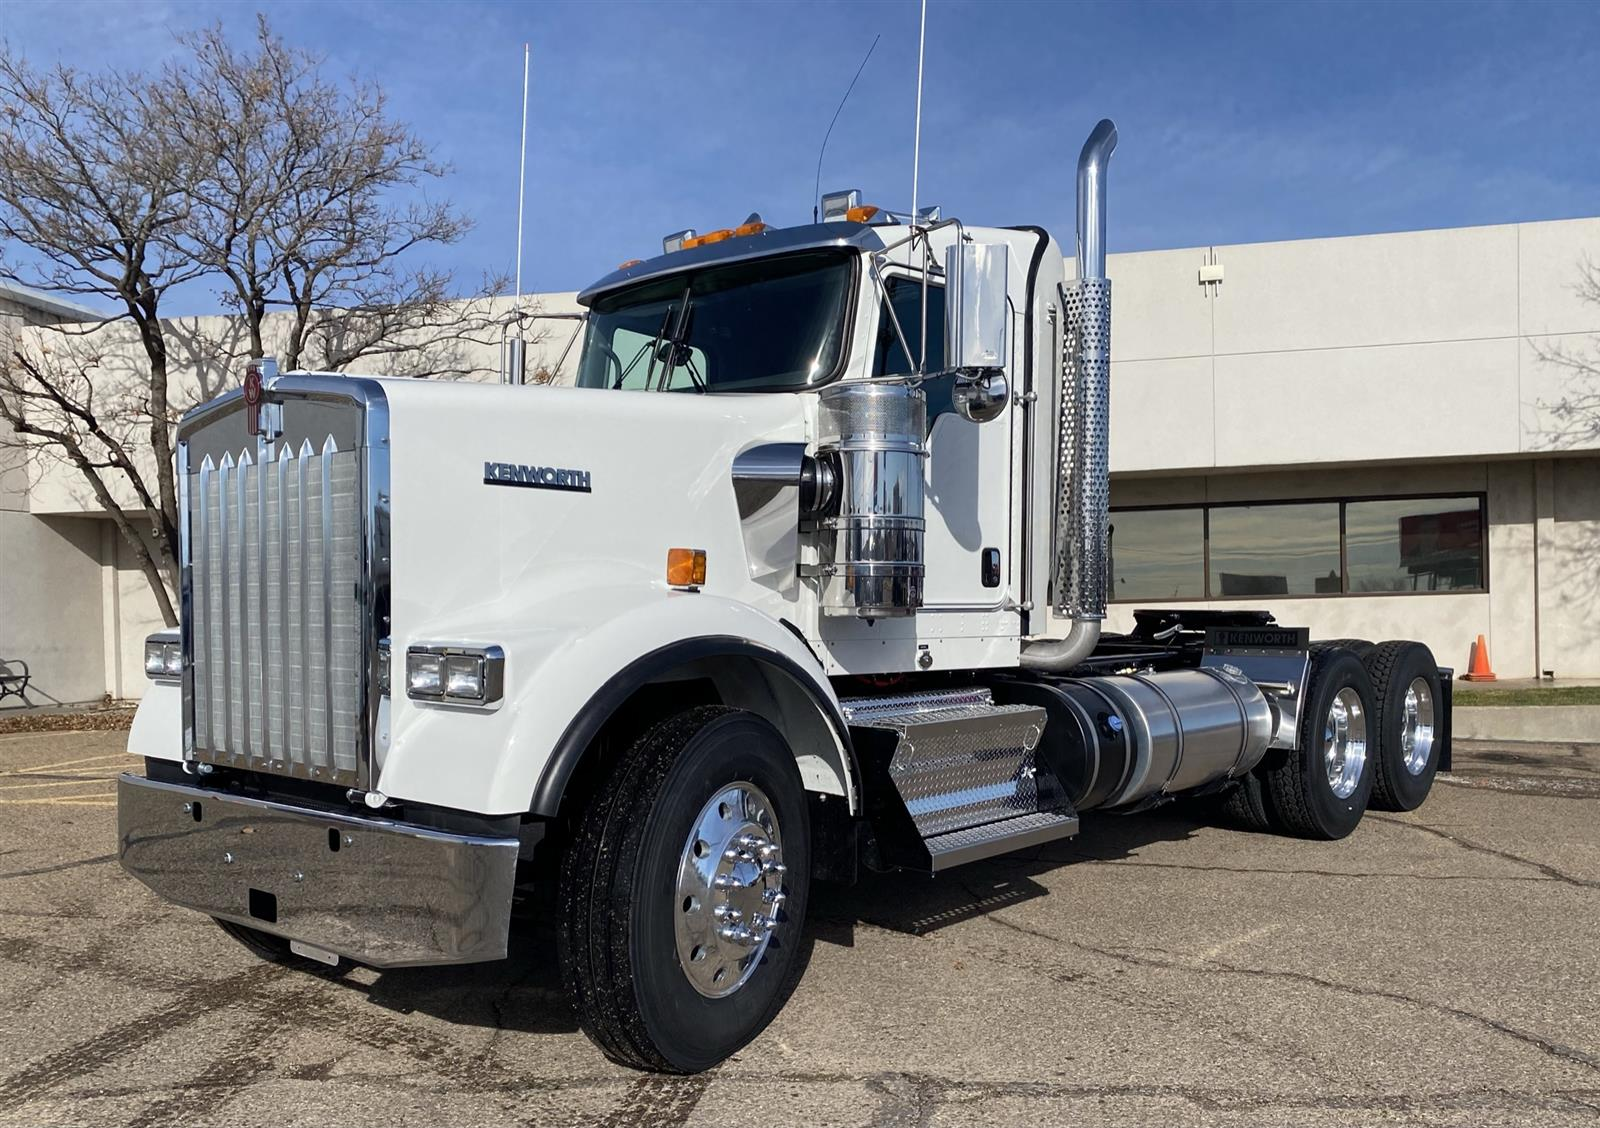 2021 Kenworth W900 6x4, Tractor #MR461488 - photo 1